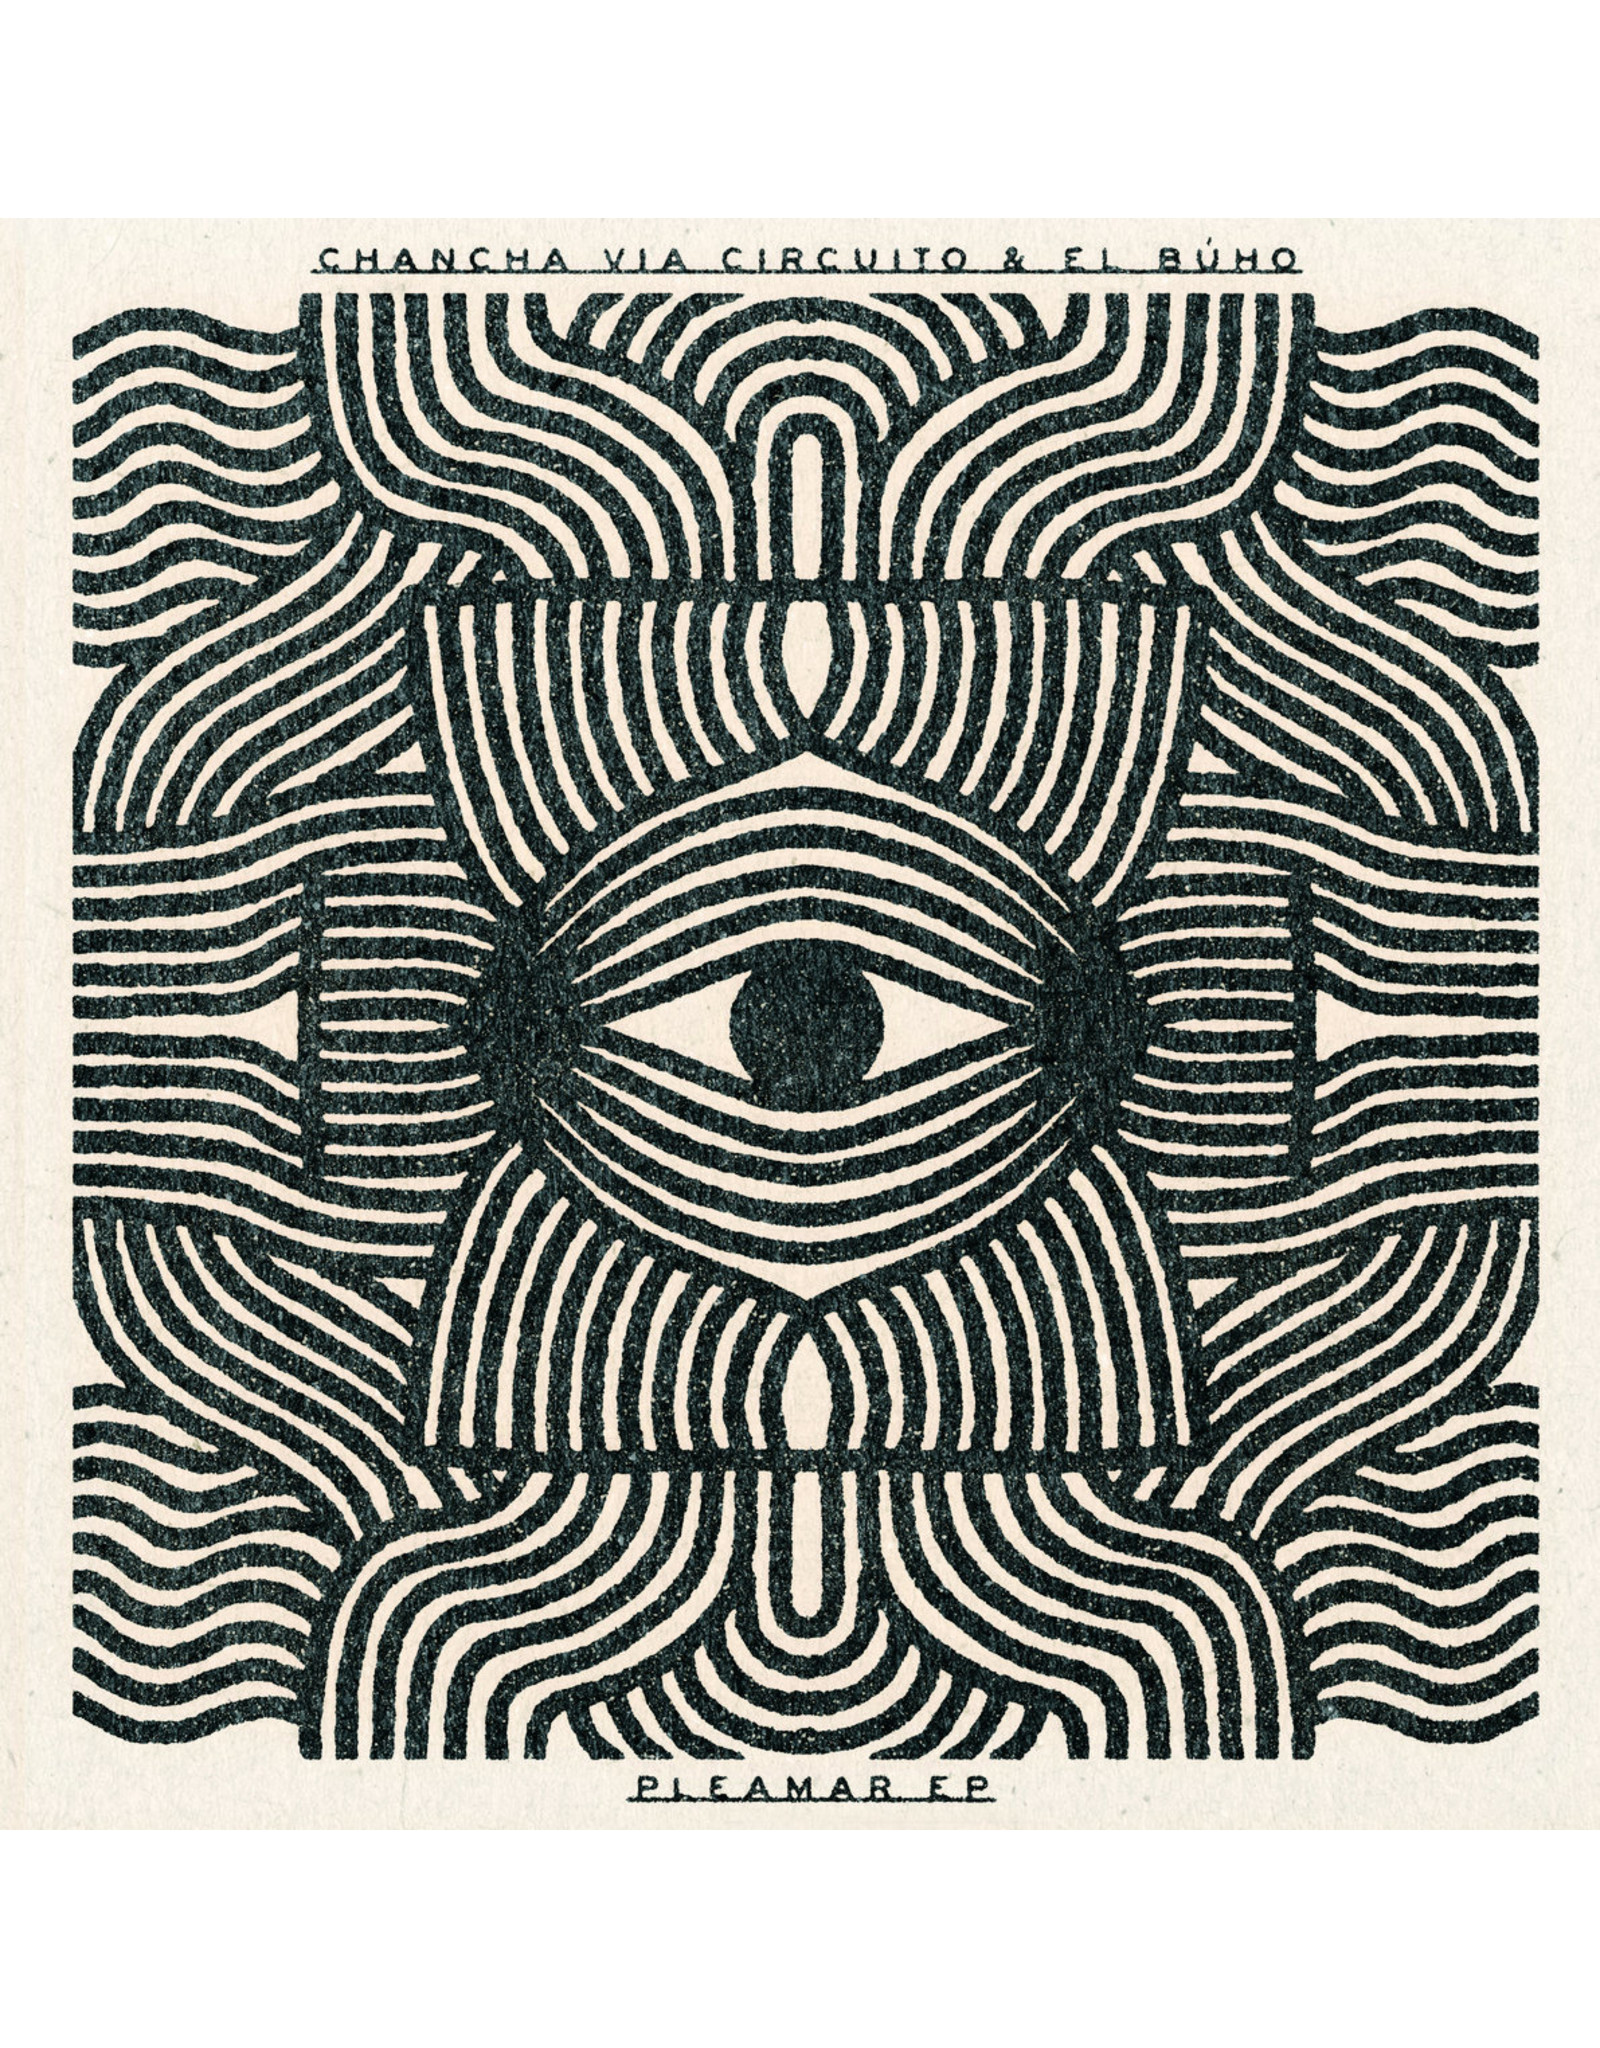 "New Vinyl Chancha Via Circuito & El Buho - Pleamar (Colored) EP 12"""